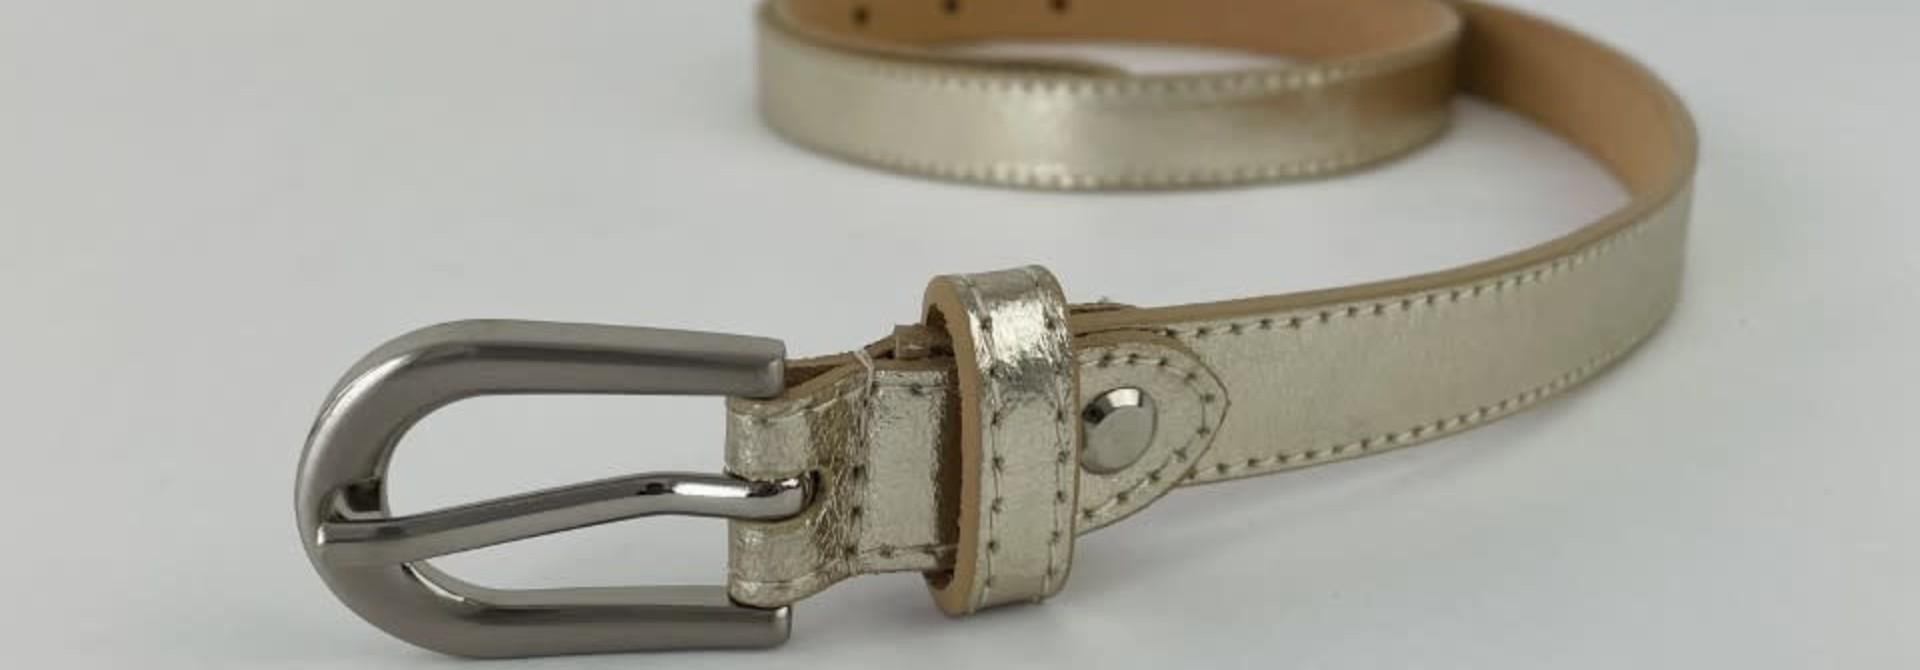 Etna metalic  genuine belt Gold